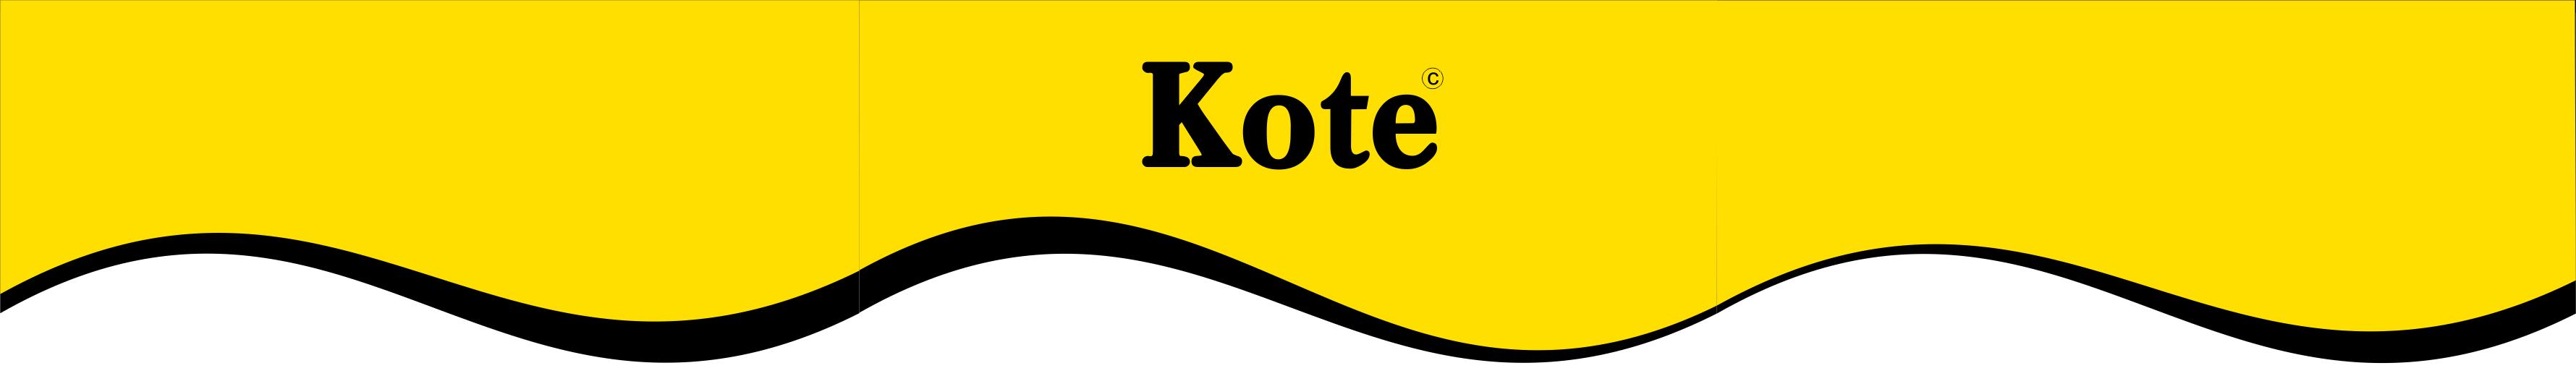 Kote Banner